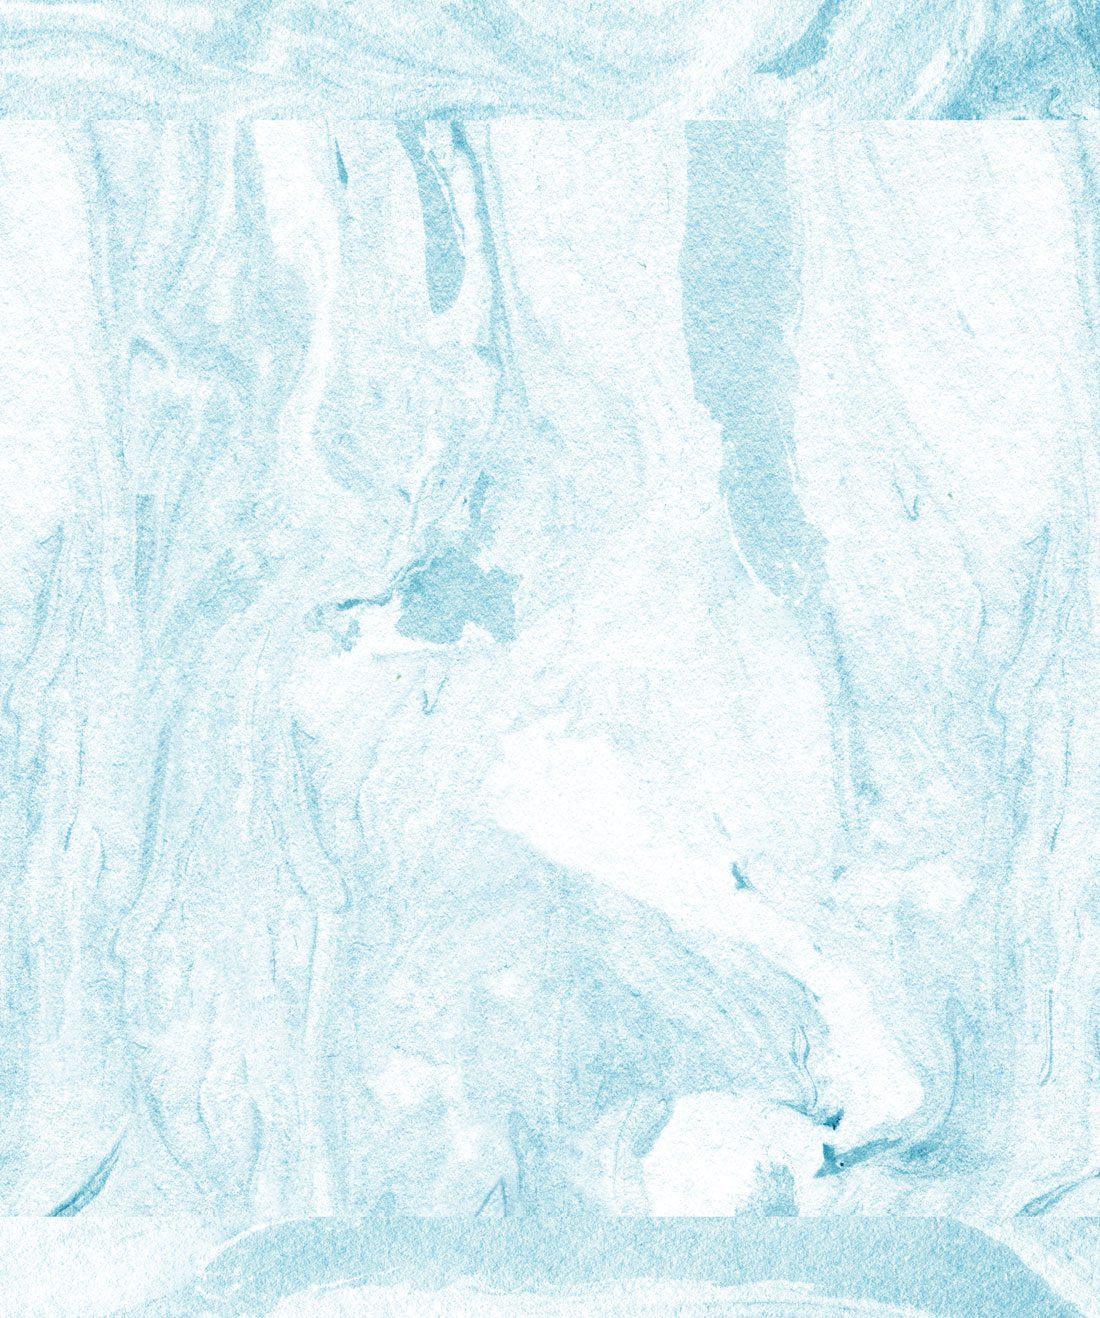 Shoreline Blue Marble like Wallpaper Milton King 1100x1318